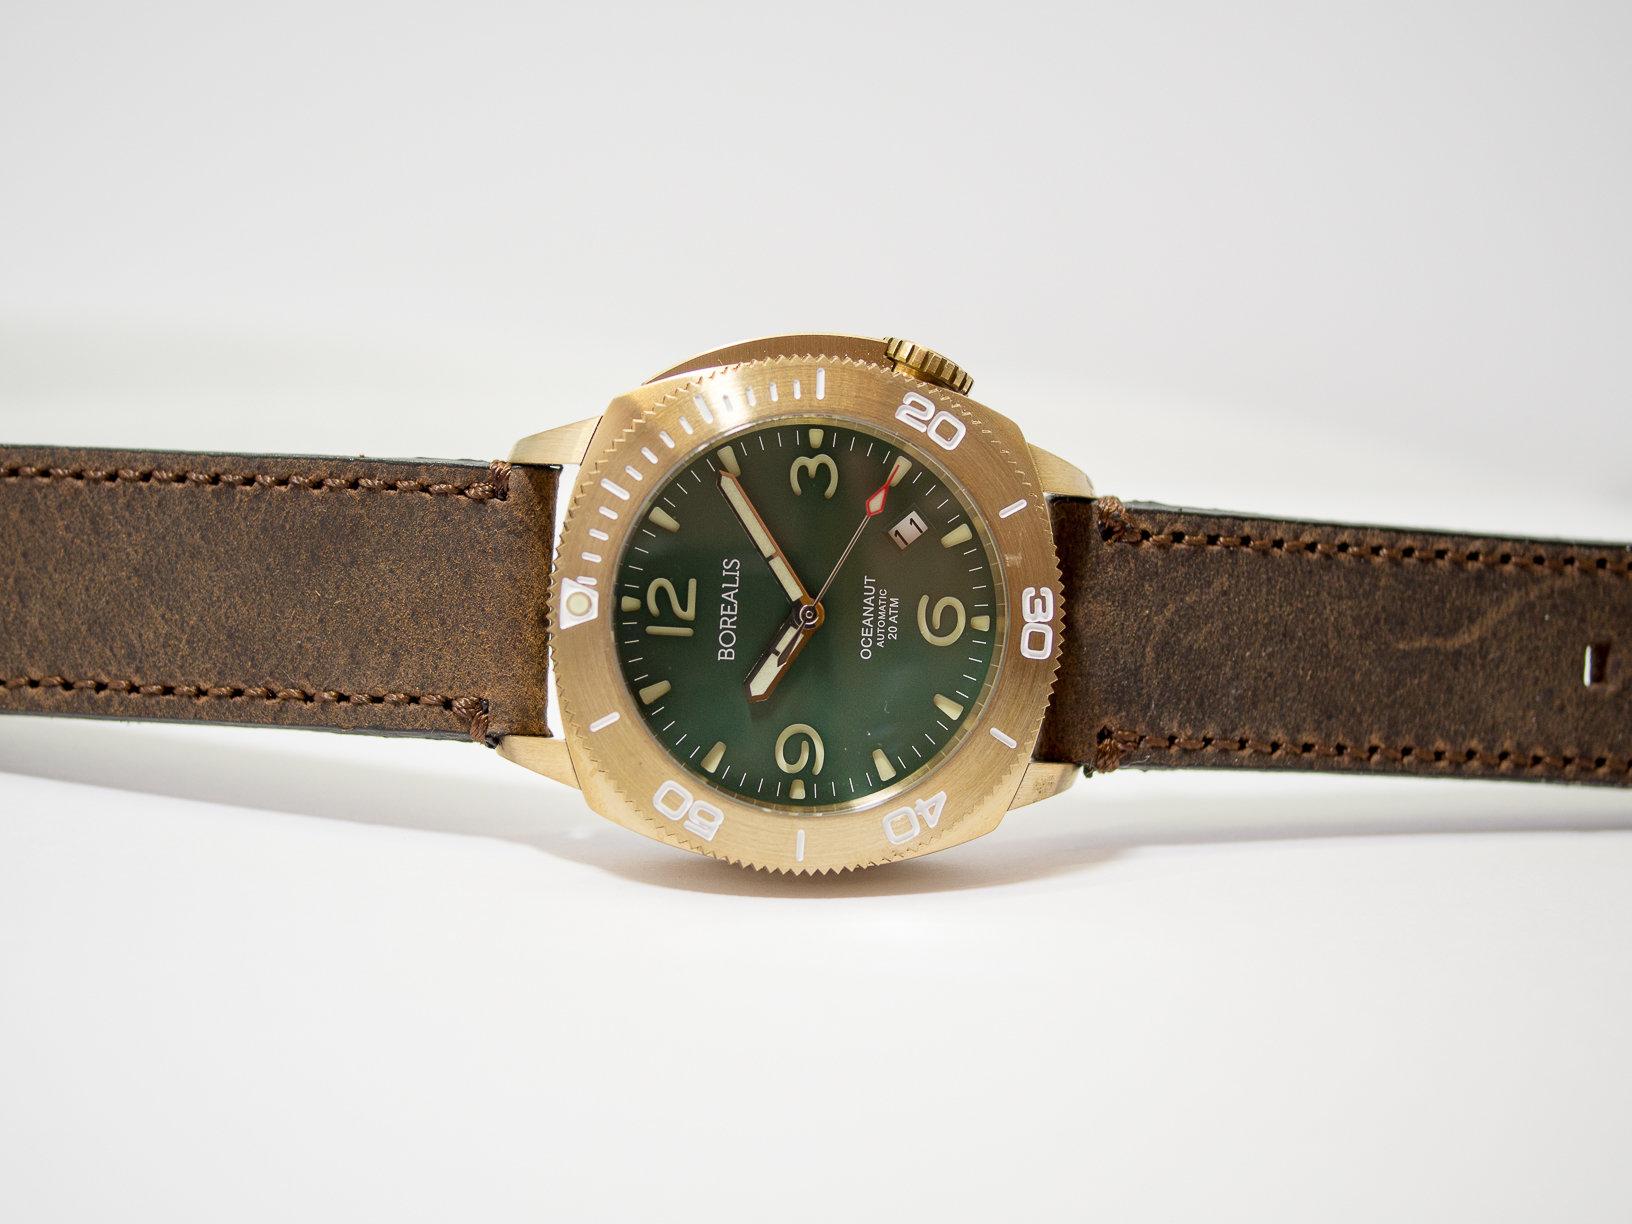 Borealis Oceanaut Aluminum Bronze Green Date 200m NH35 Automatic Diver Watch